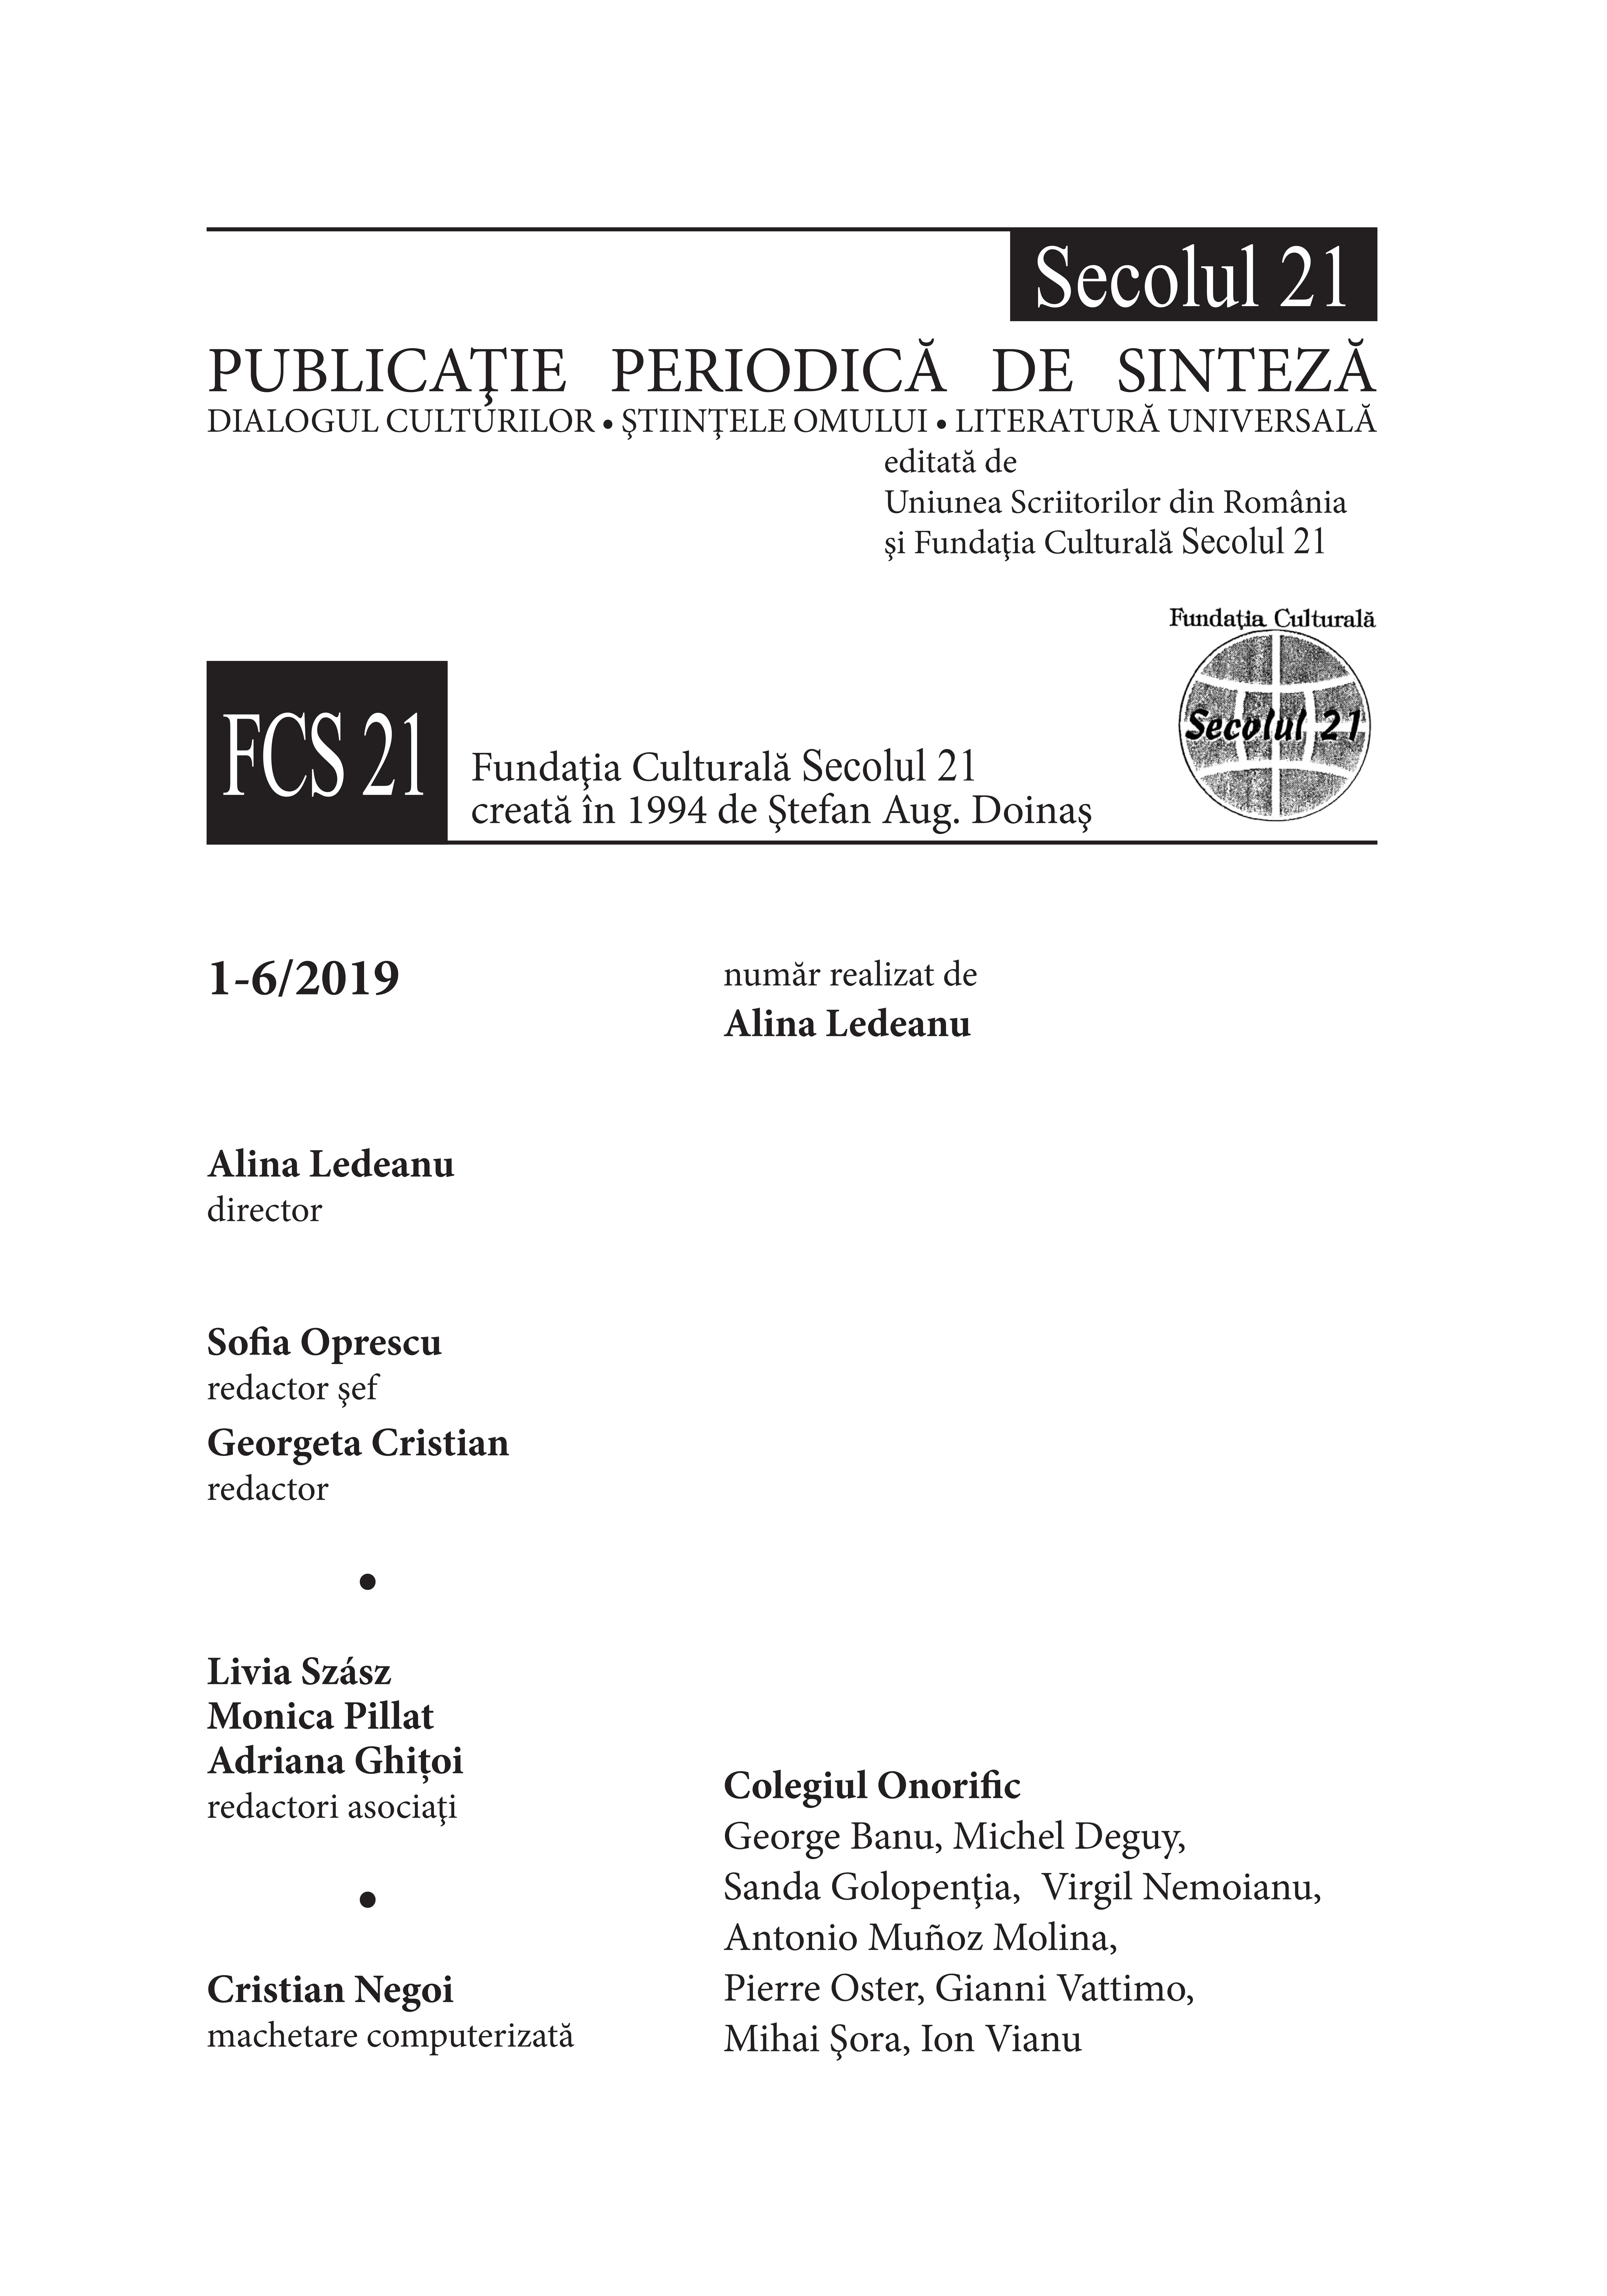 Secolul 21 - Ion Vianu 1-6/2019 caseta redactionala